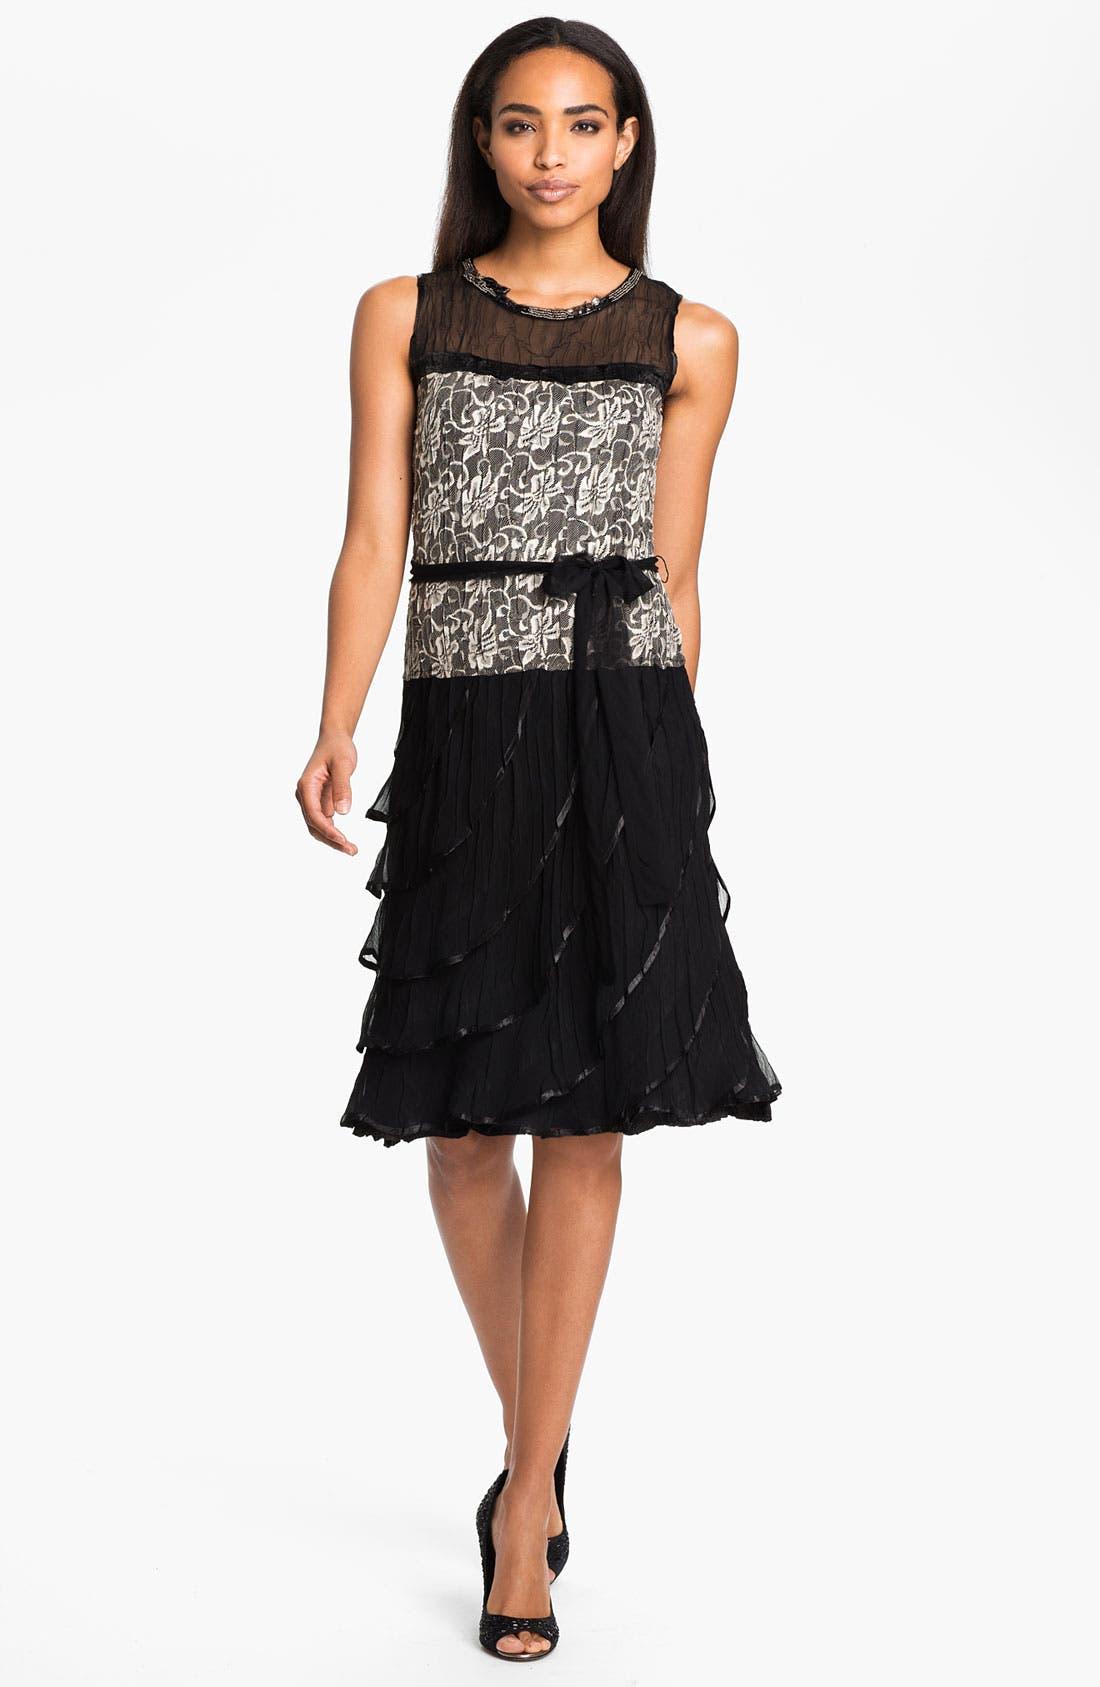 Alternate Image 1 Selected - Black by Komarov Lace & Chiffon Dress